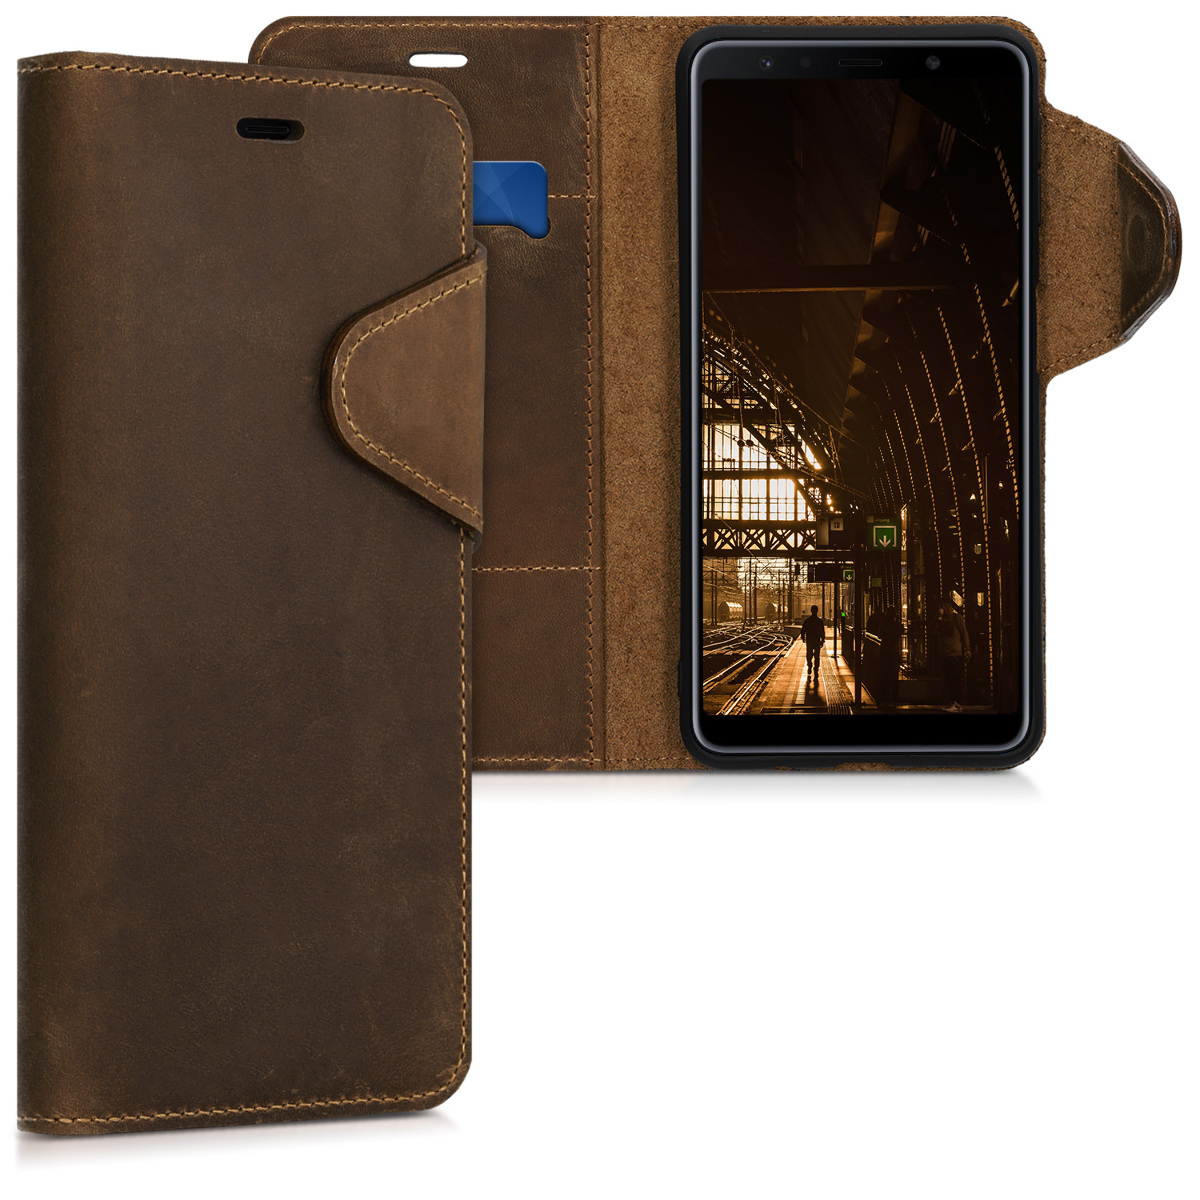 Kalibri Δερμάτινη Suede Θήκη - Πορτοφόλι  Samsung Galaxy A7 (2018) -  Brown (46602.05)